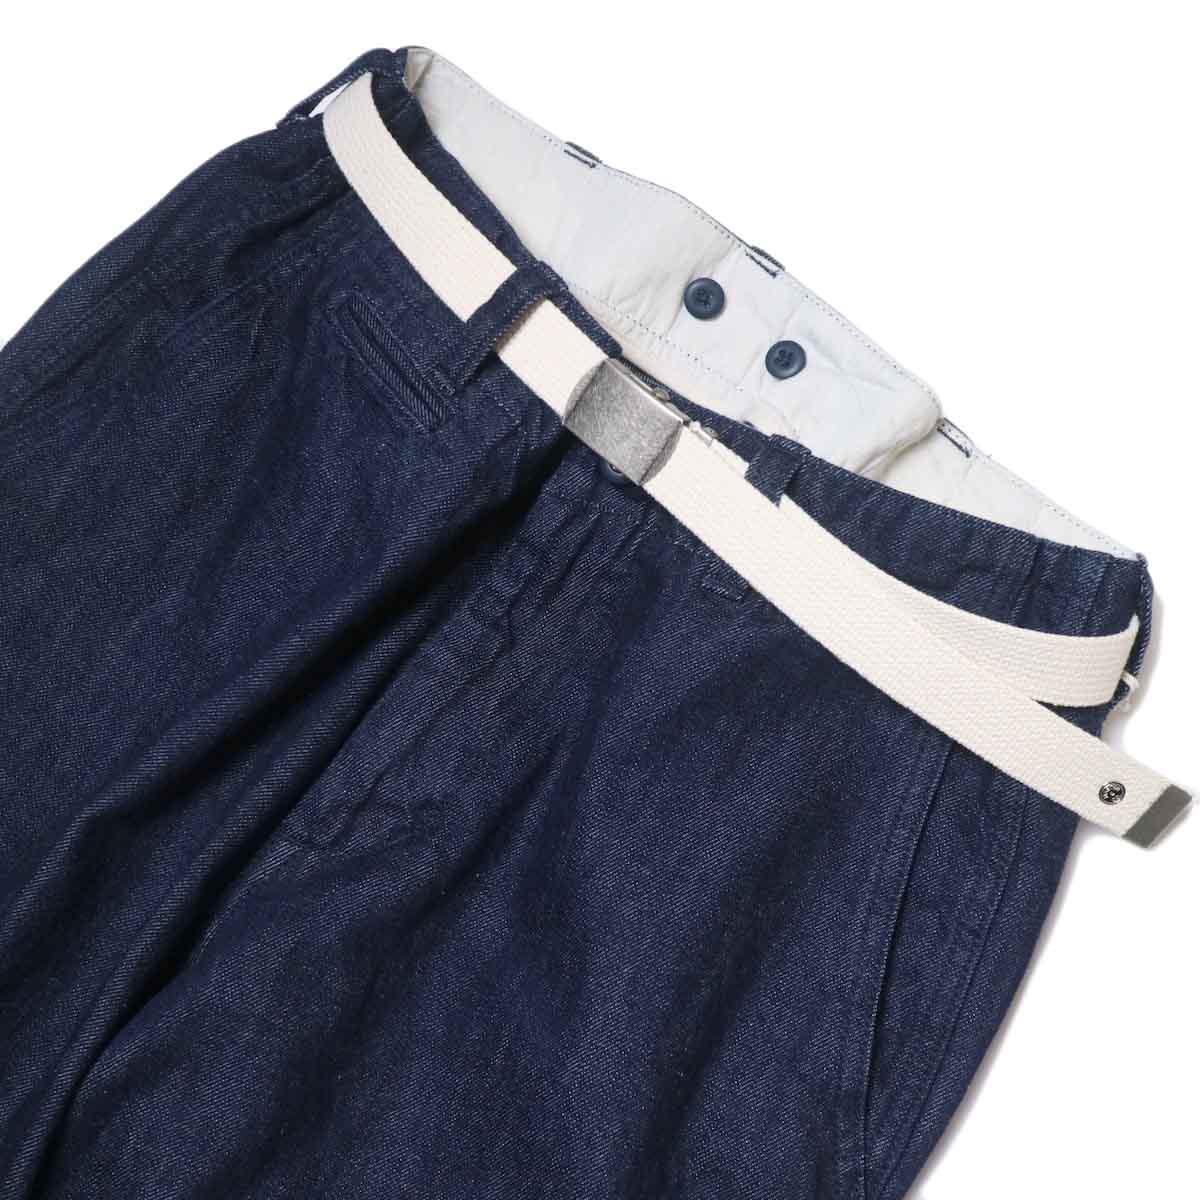 MASTER&Co. / ONE WASHED DENIM LONG PANTS フロントアップ①